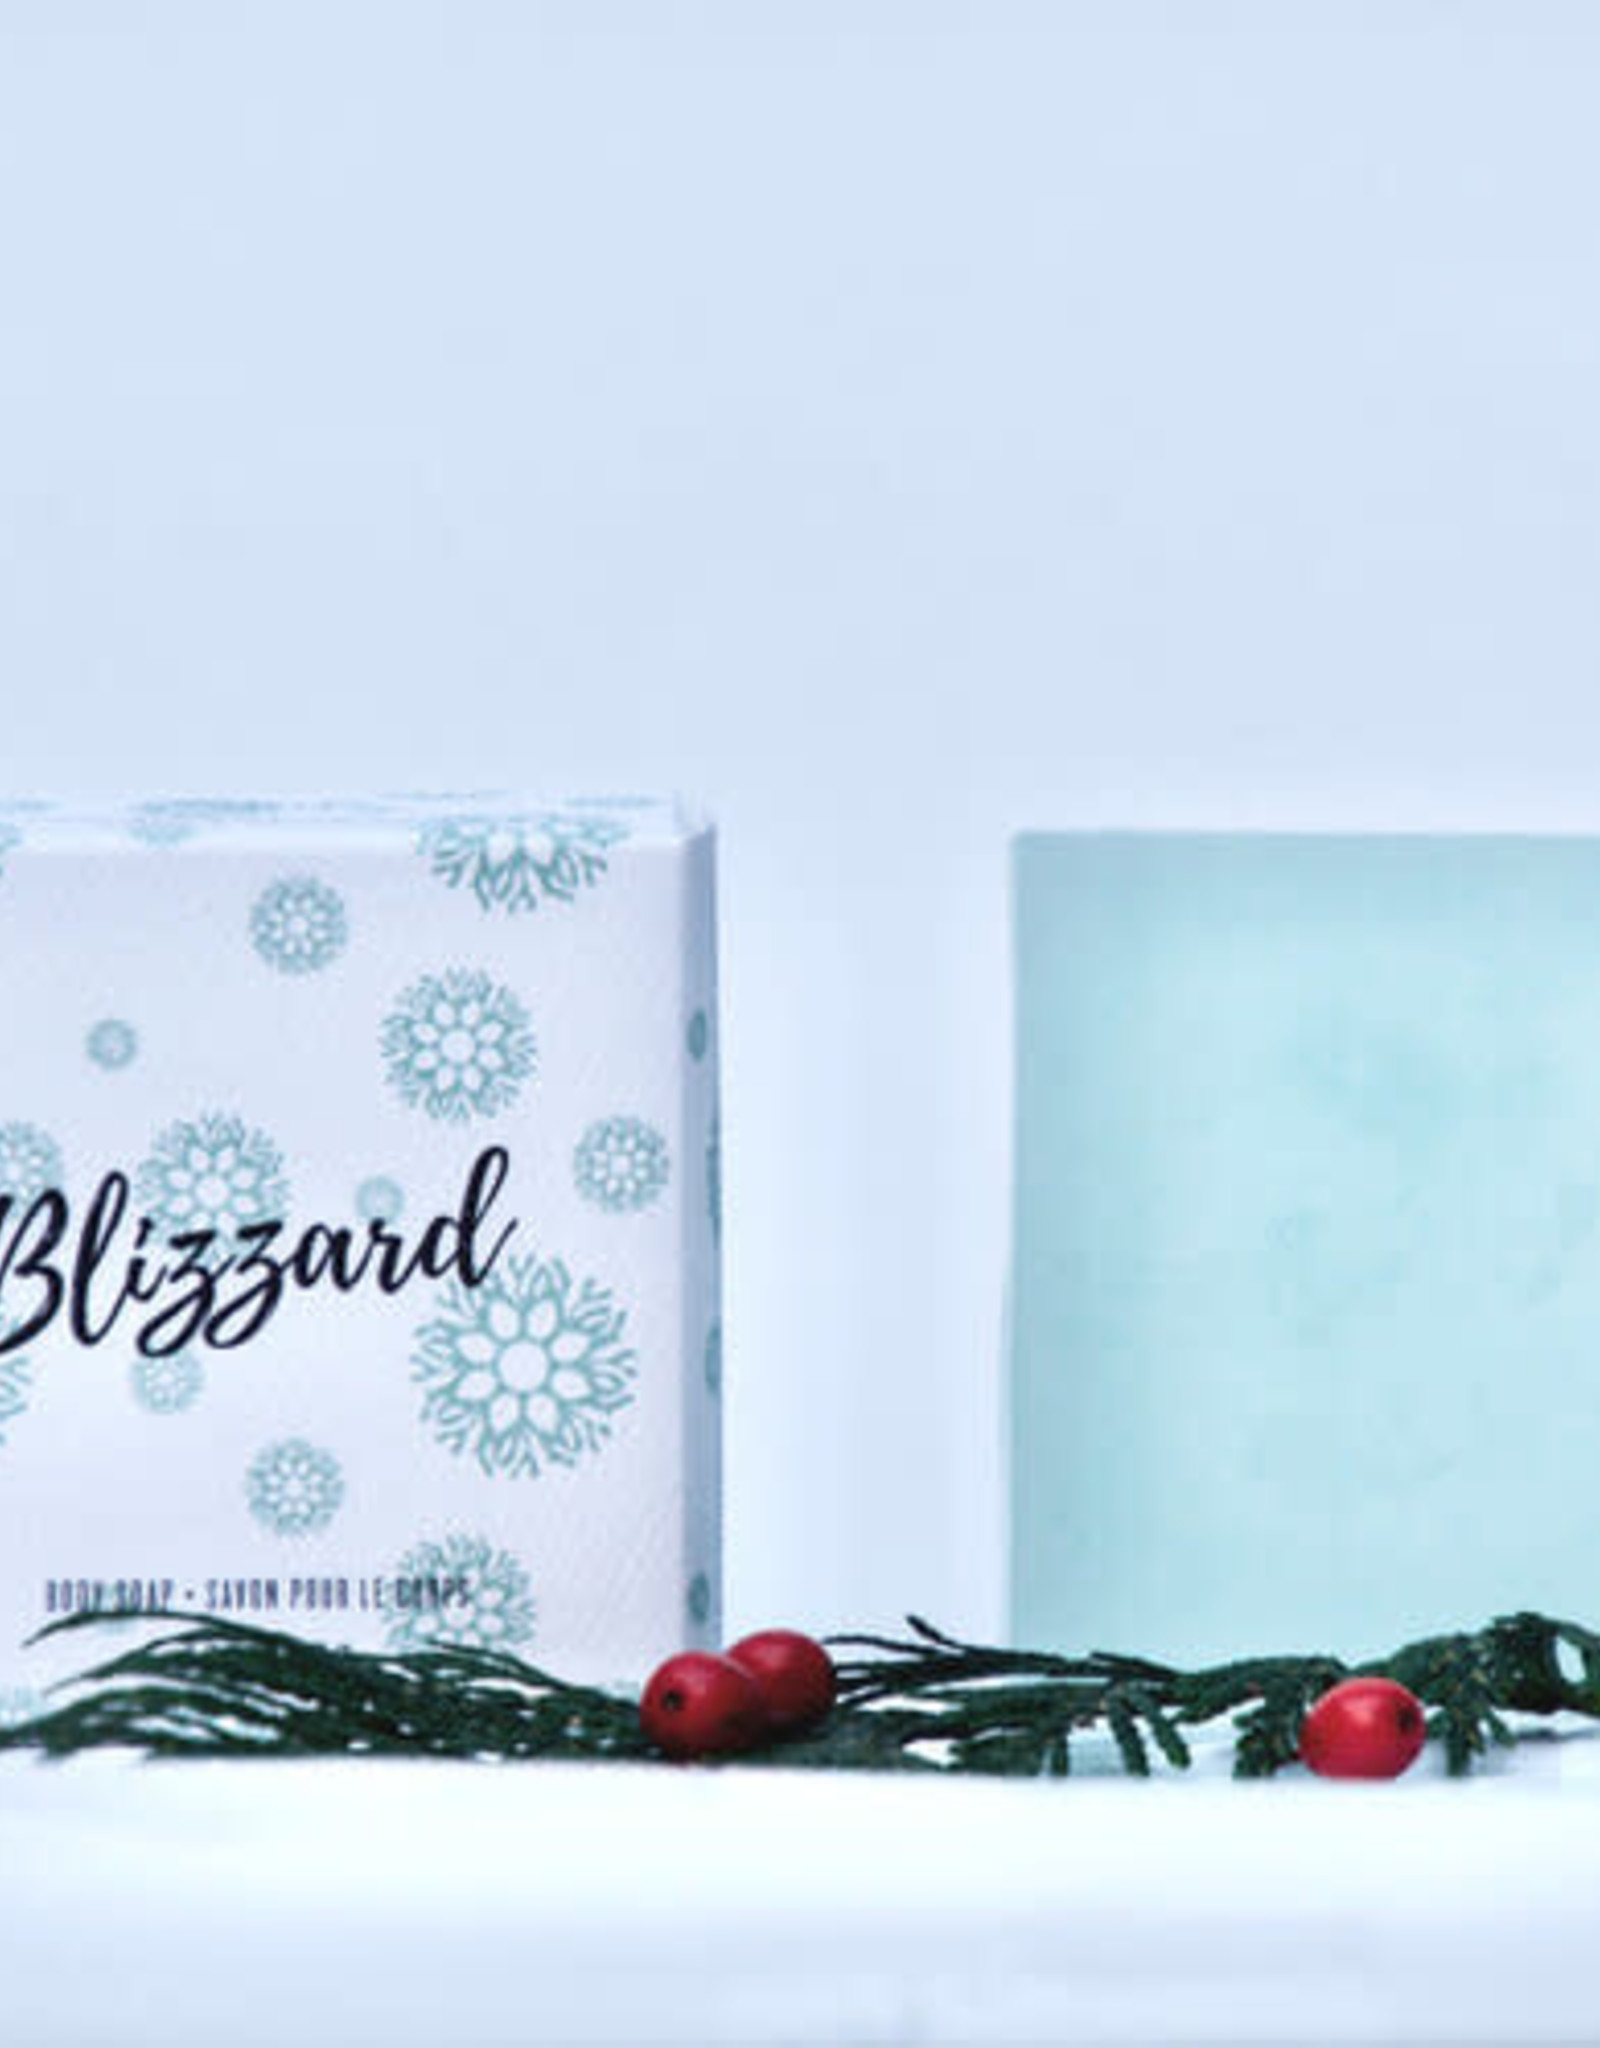 Sealuxe Blizzard Soap Bar